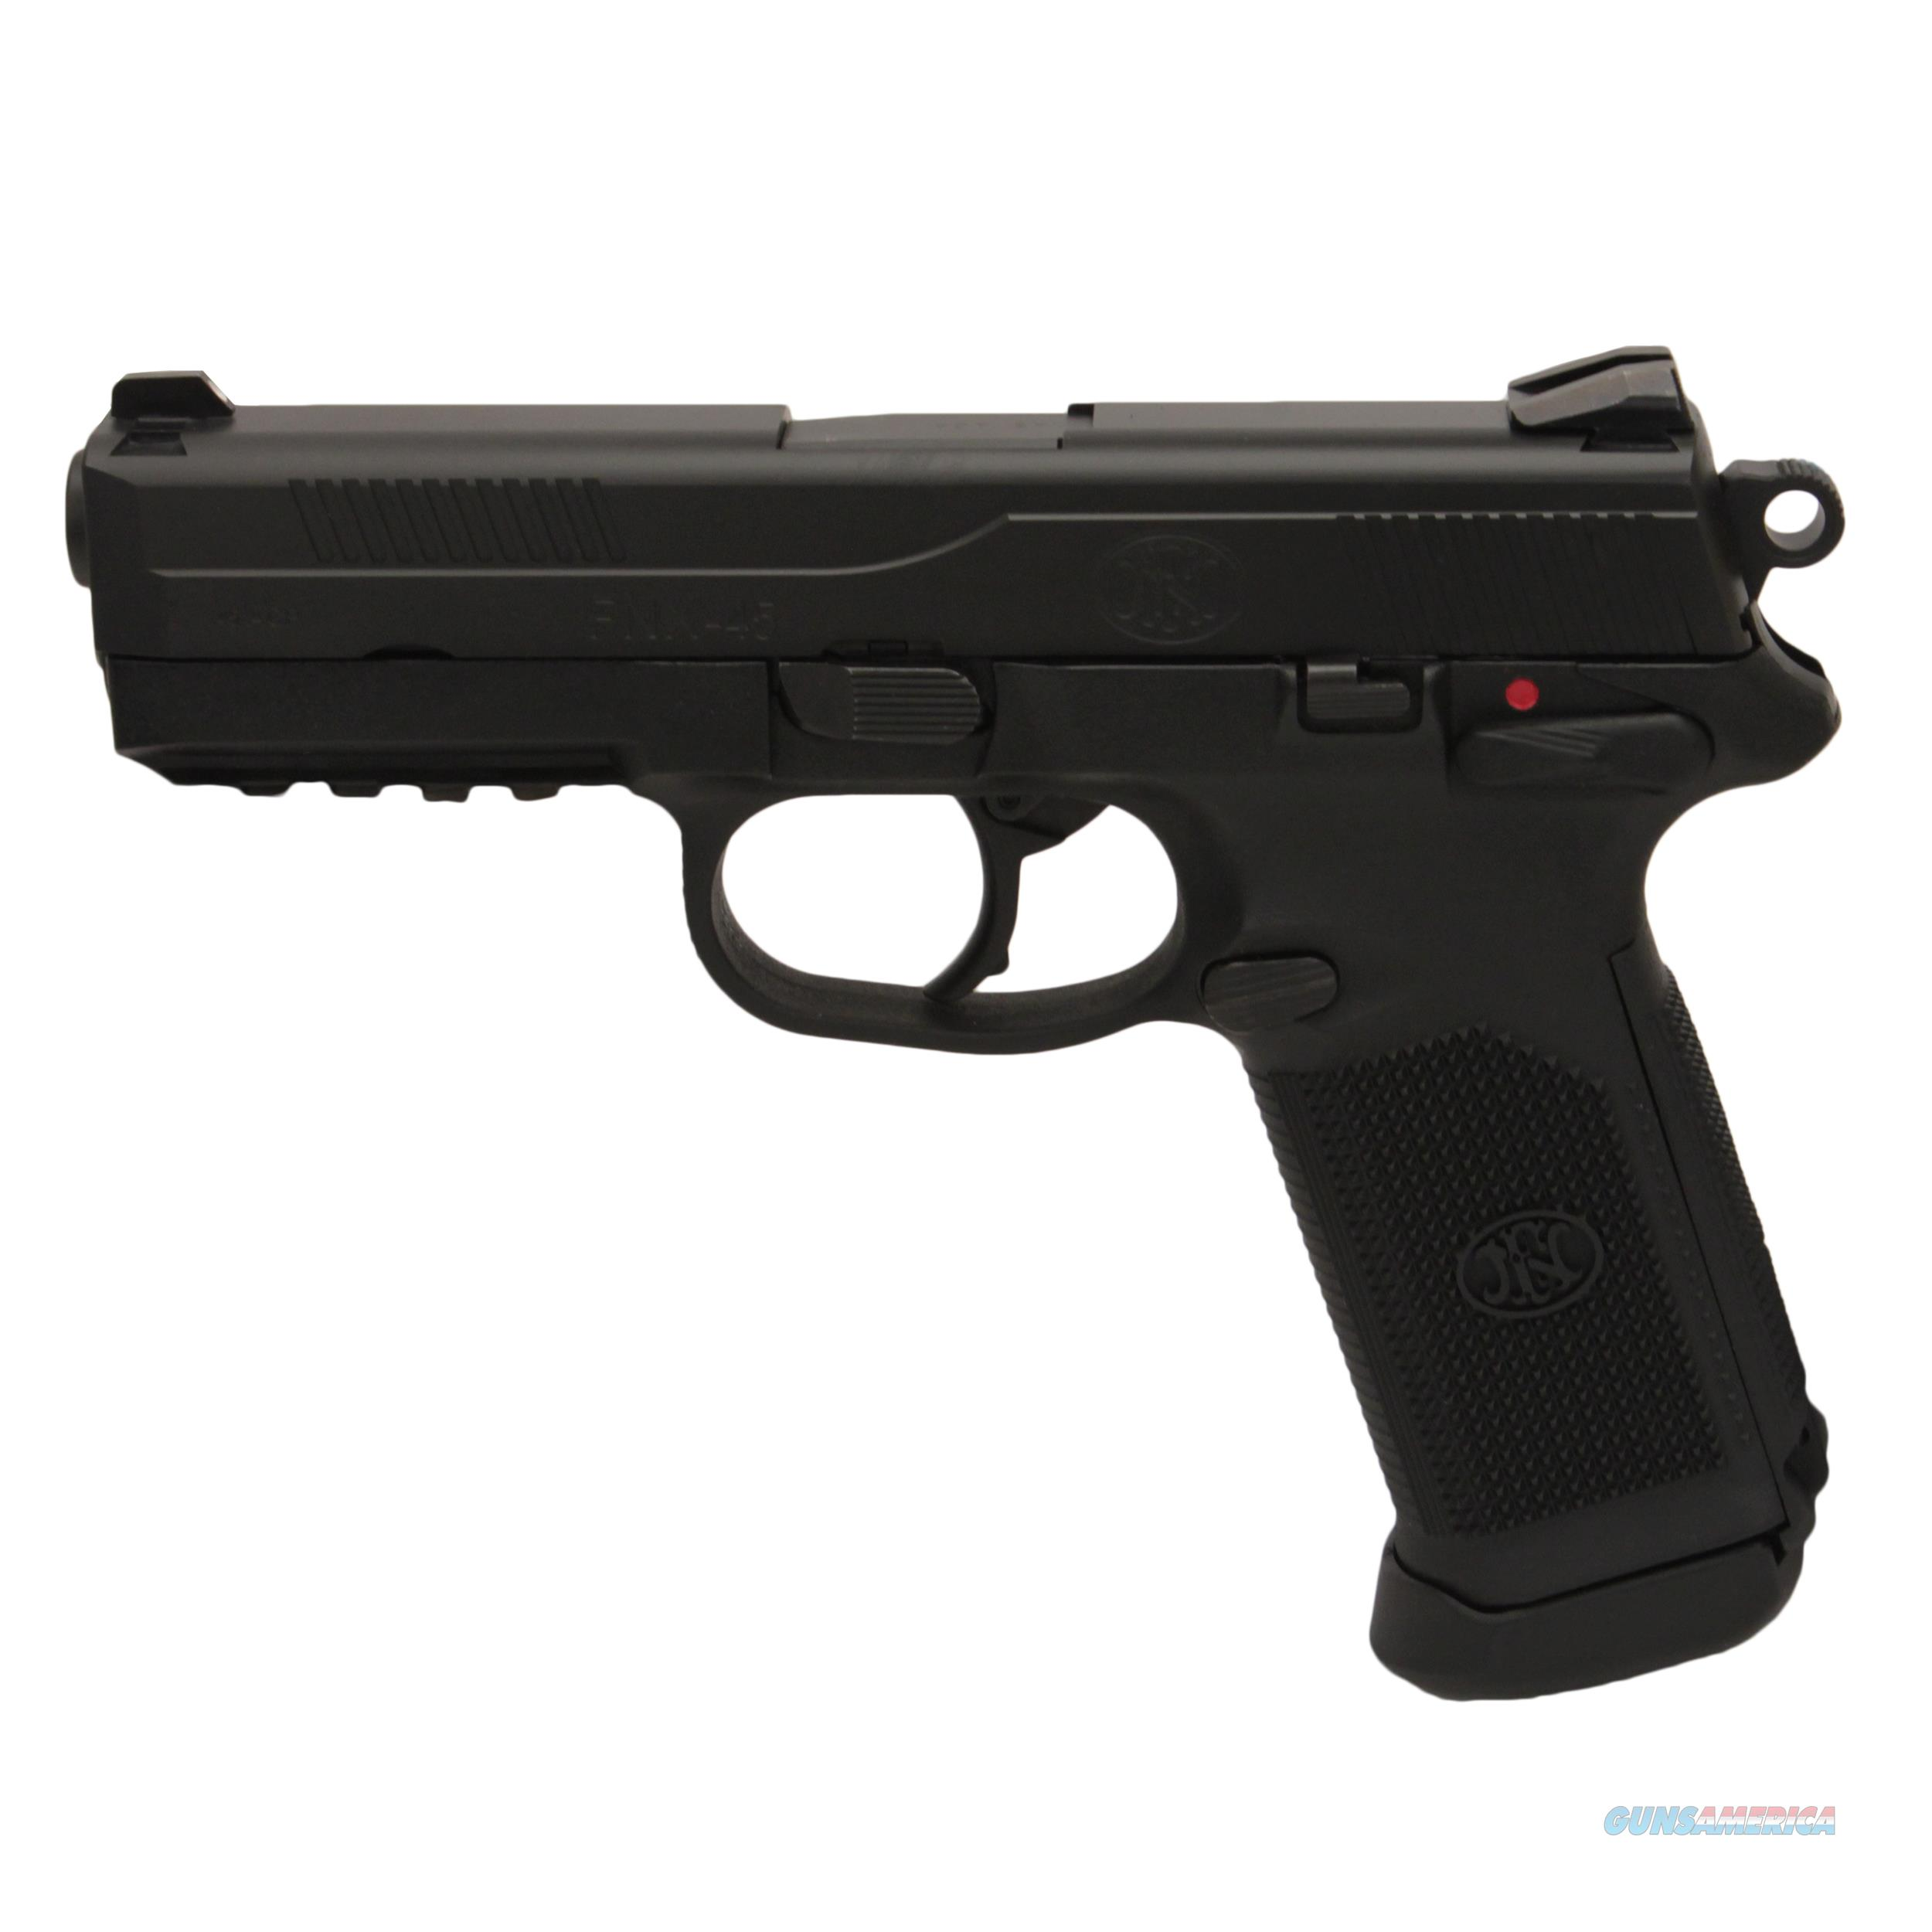 Fn Manufacturing Fnx-45 Usg Da/Sa Manual Safety 66960  Guns > Pistols > F Misc Pistols